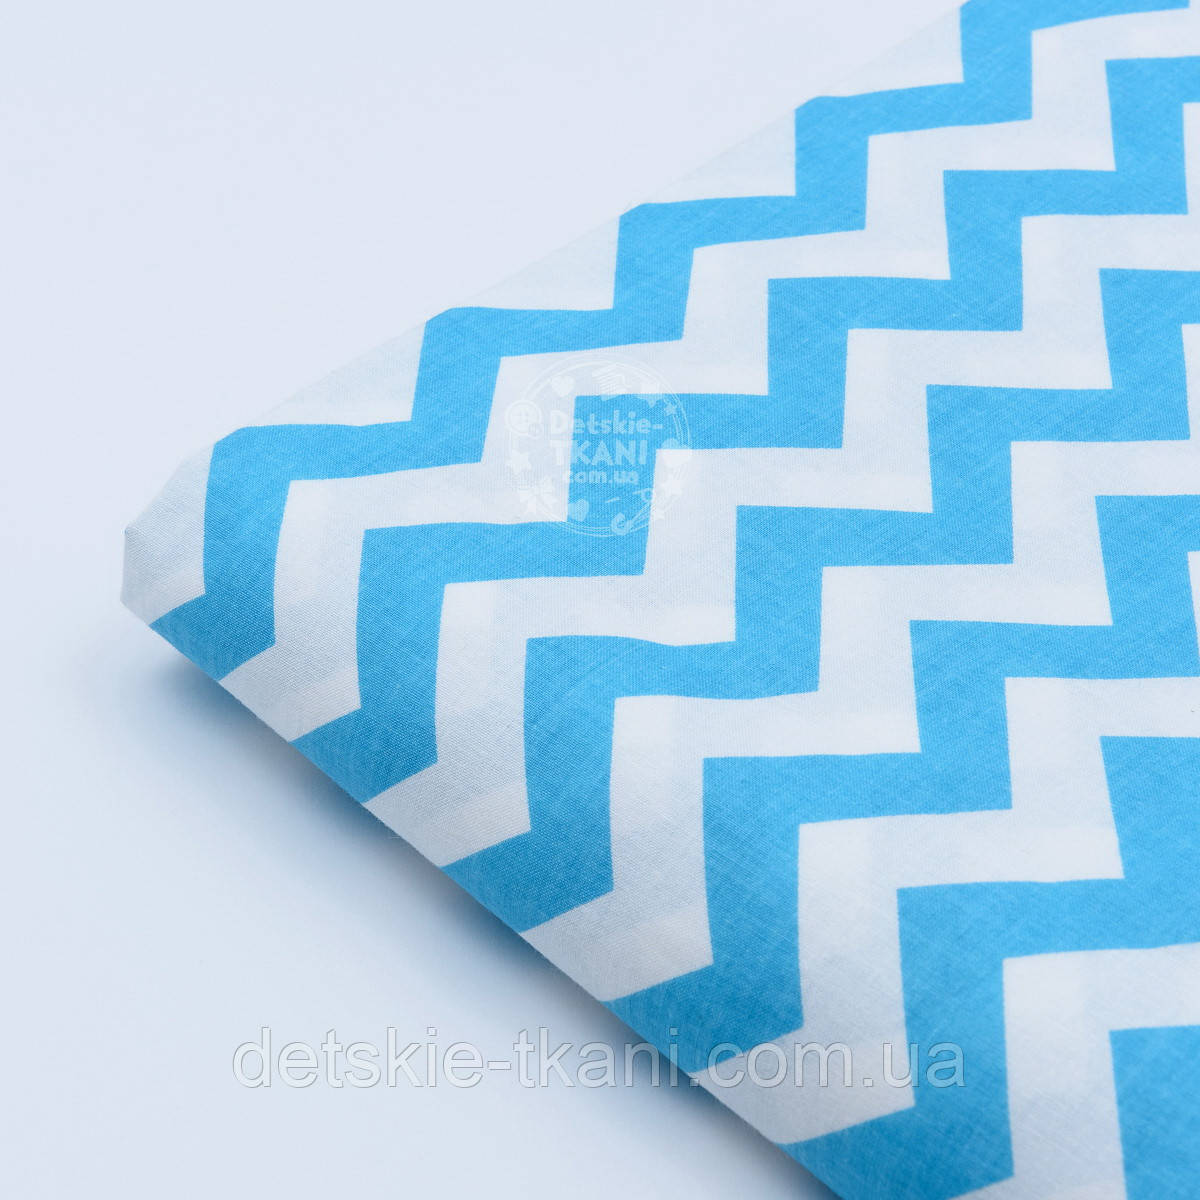 Отрез ткани №736а с зигзагом бирюзового цвета, плотность 125 г/м2 , размер 48*160